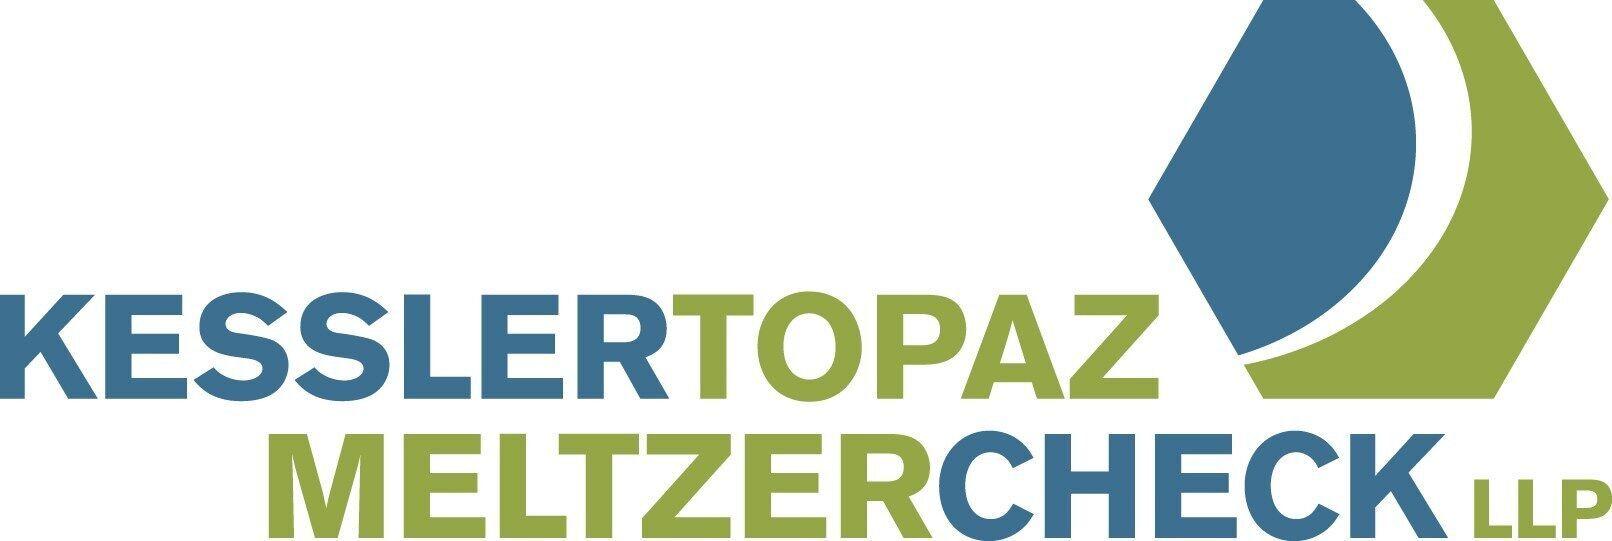 Class Action Alert: Kessler Topaz Meltzer & Check, LLP Reminds PTON Investors for Securities Fraud Class Action Lawsuit 1